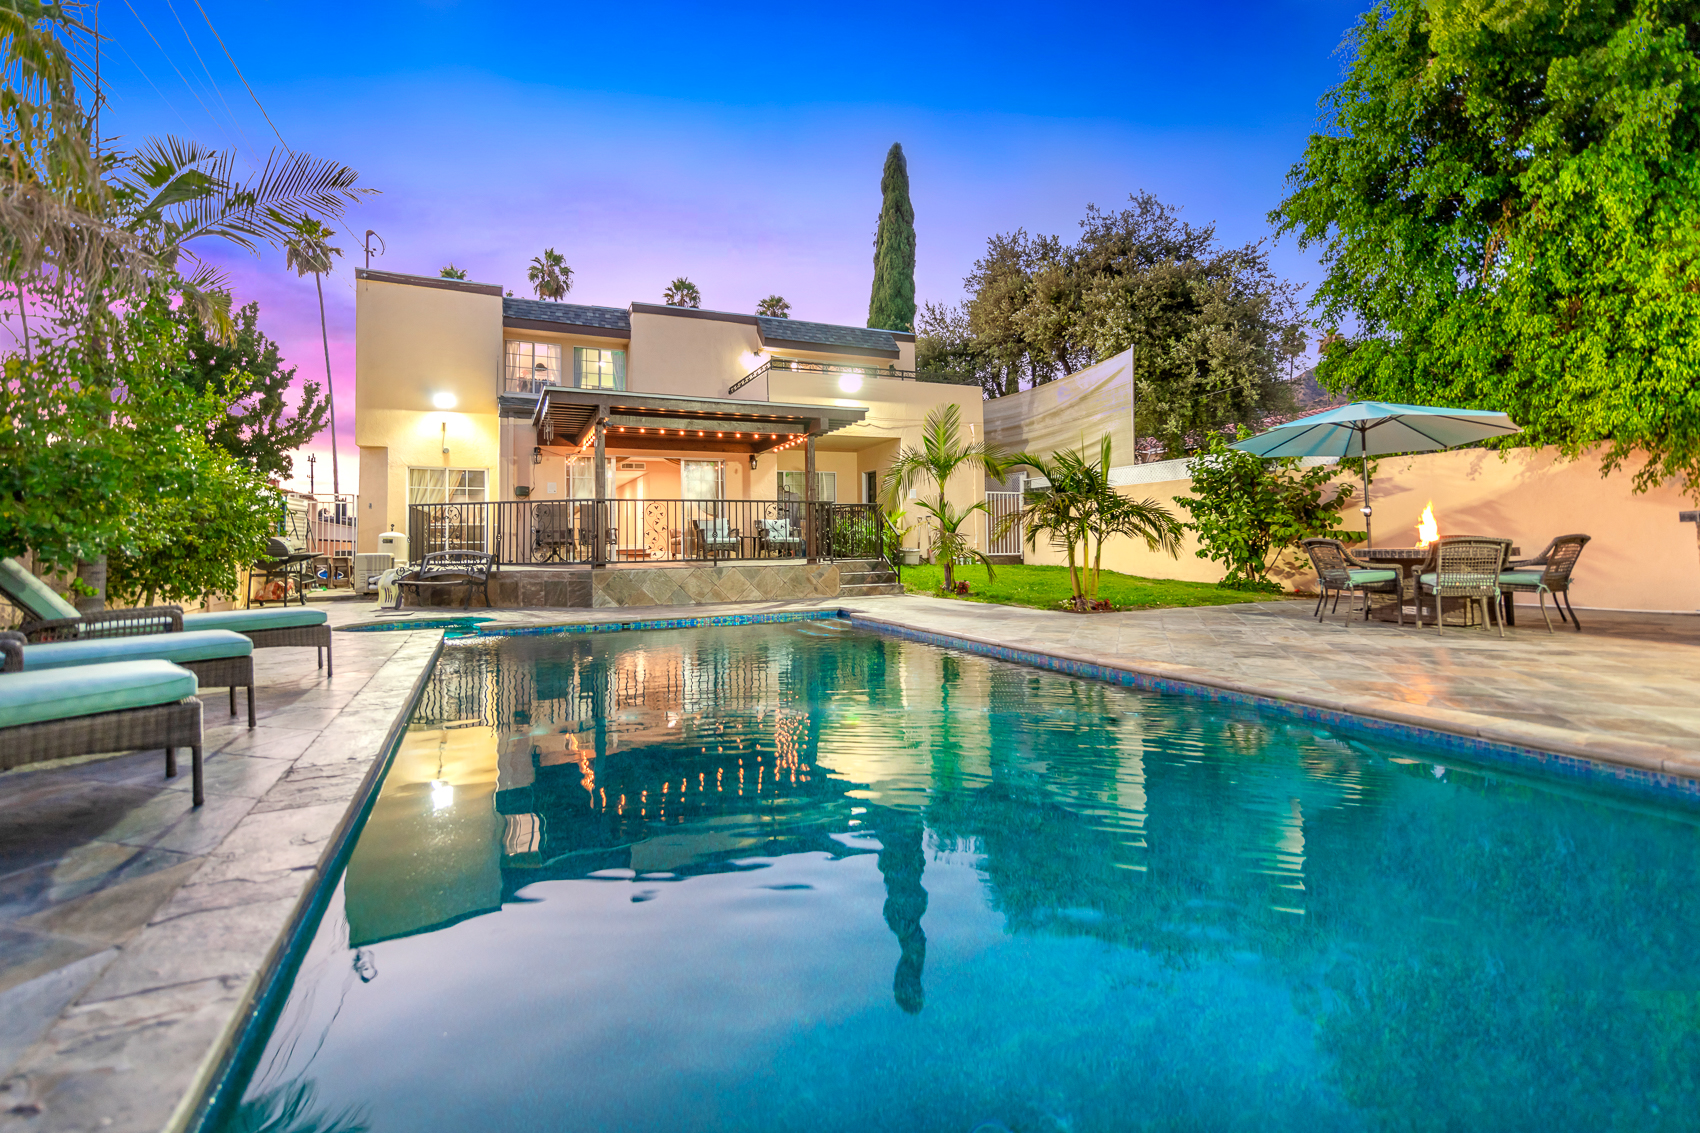 1344 Western Ave, Glendale, CA, 91201